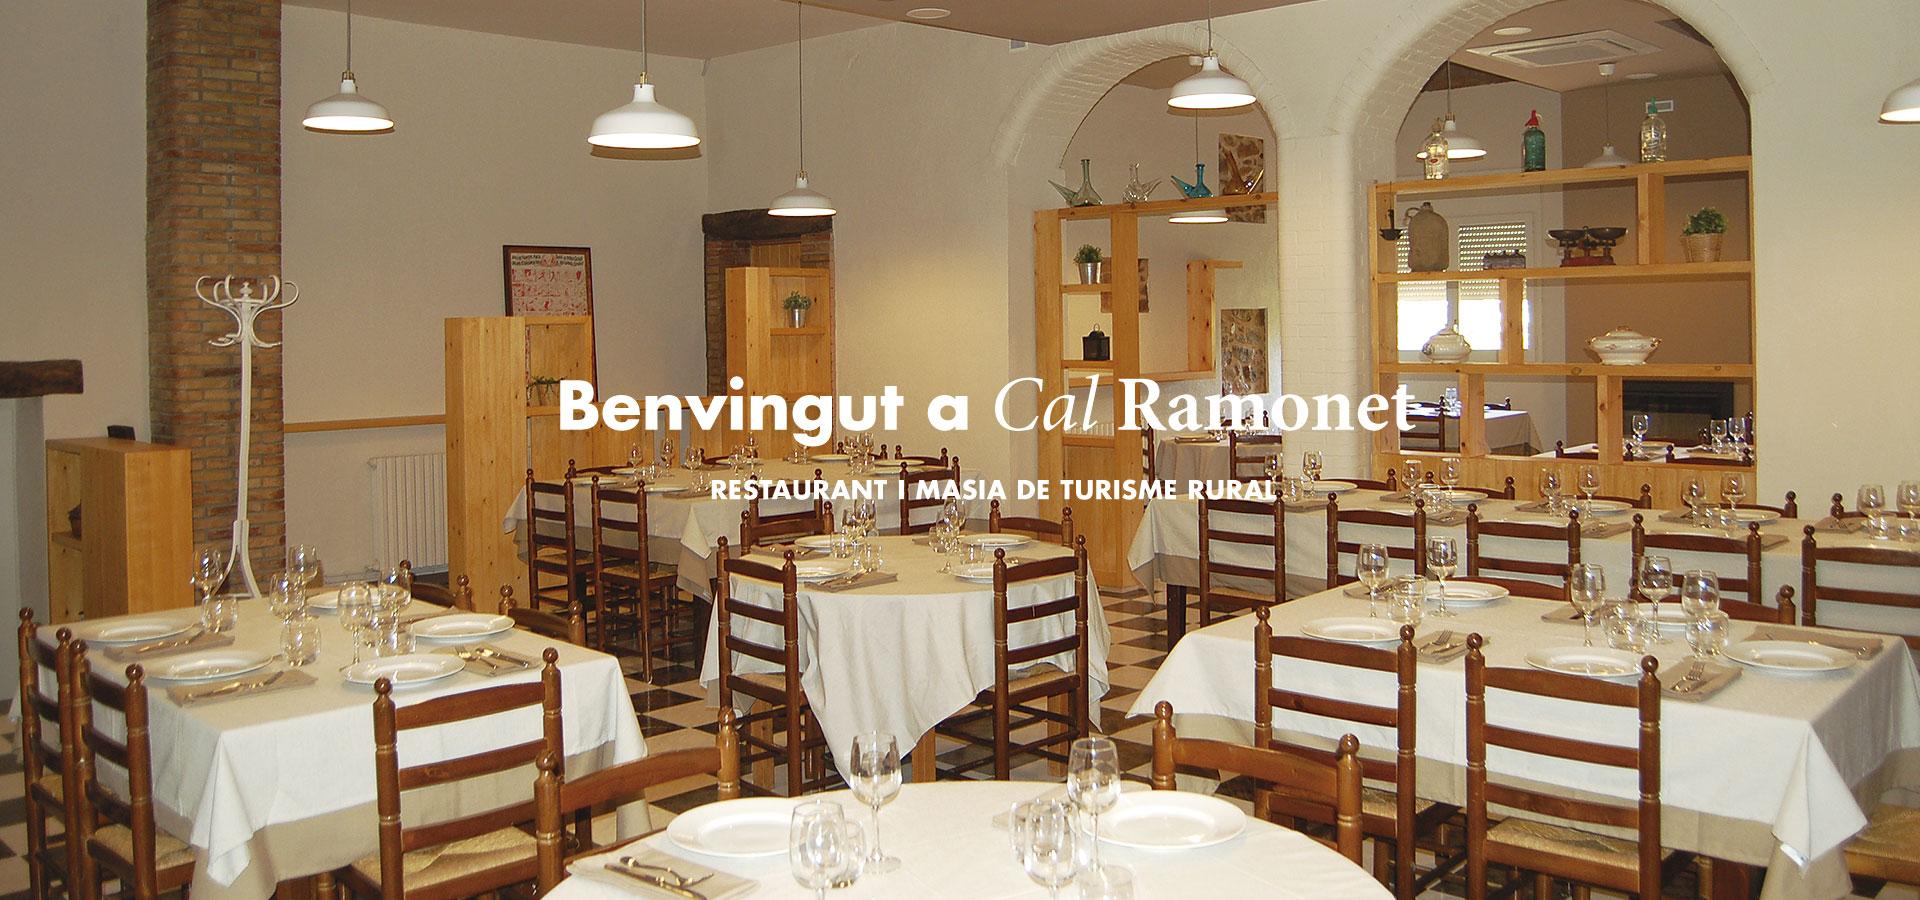 Banner-Cal-Ramonet-1